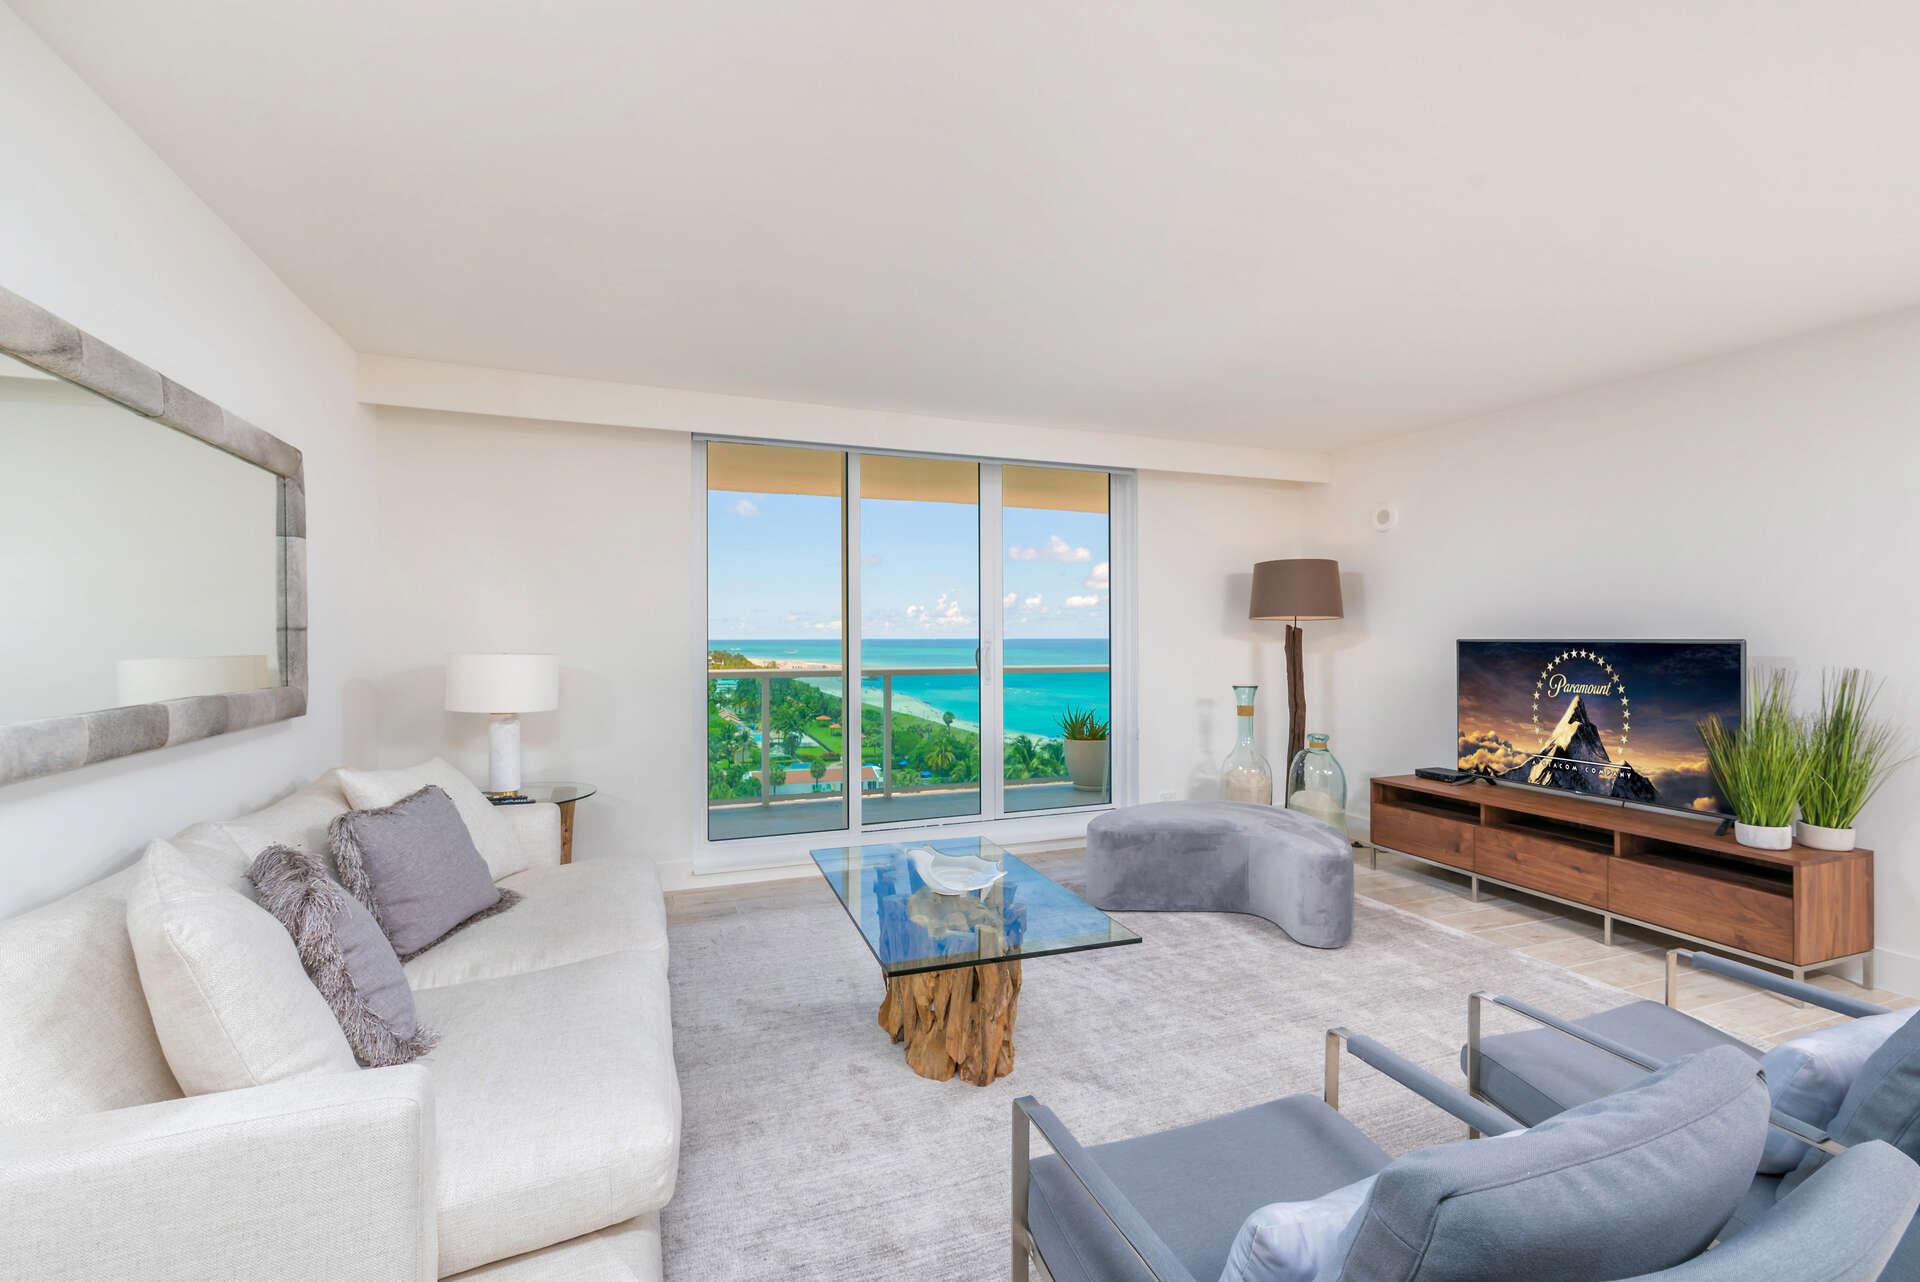 Luxury vacation rentals usa - Florida - Miami beach - Eco hotel southbeach - #1019 | 3 BDM Oceanfront - Image 1/23